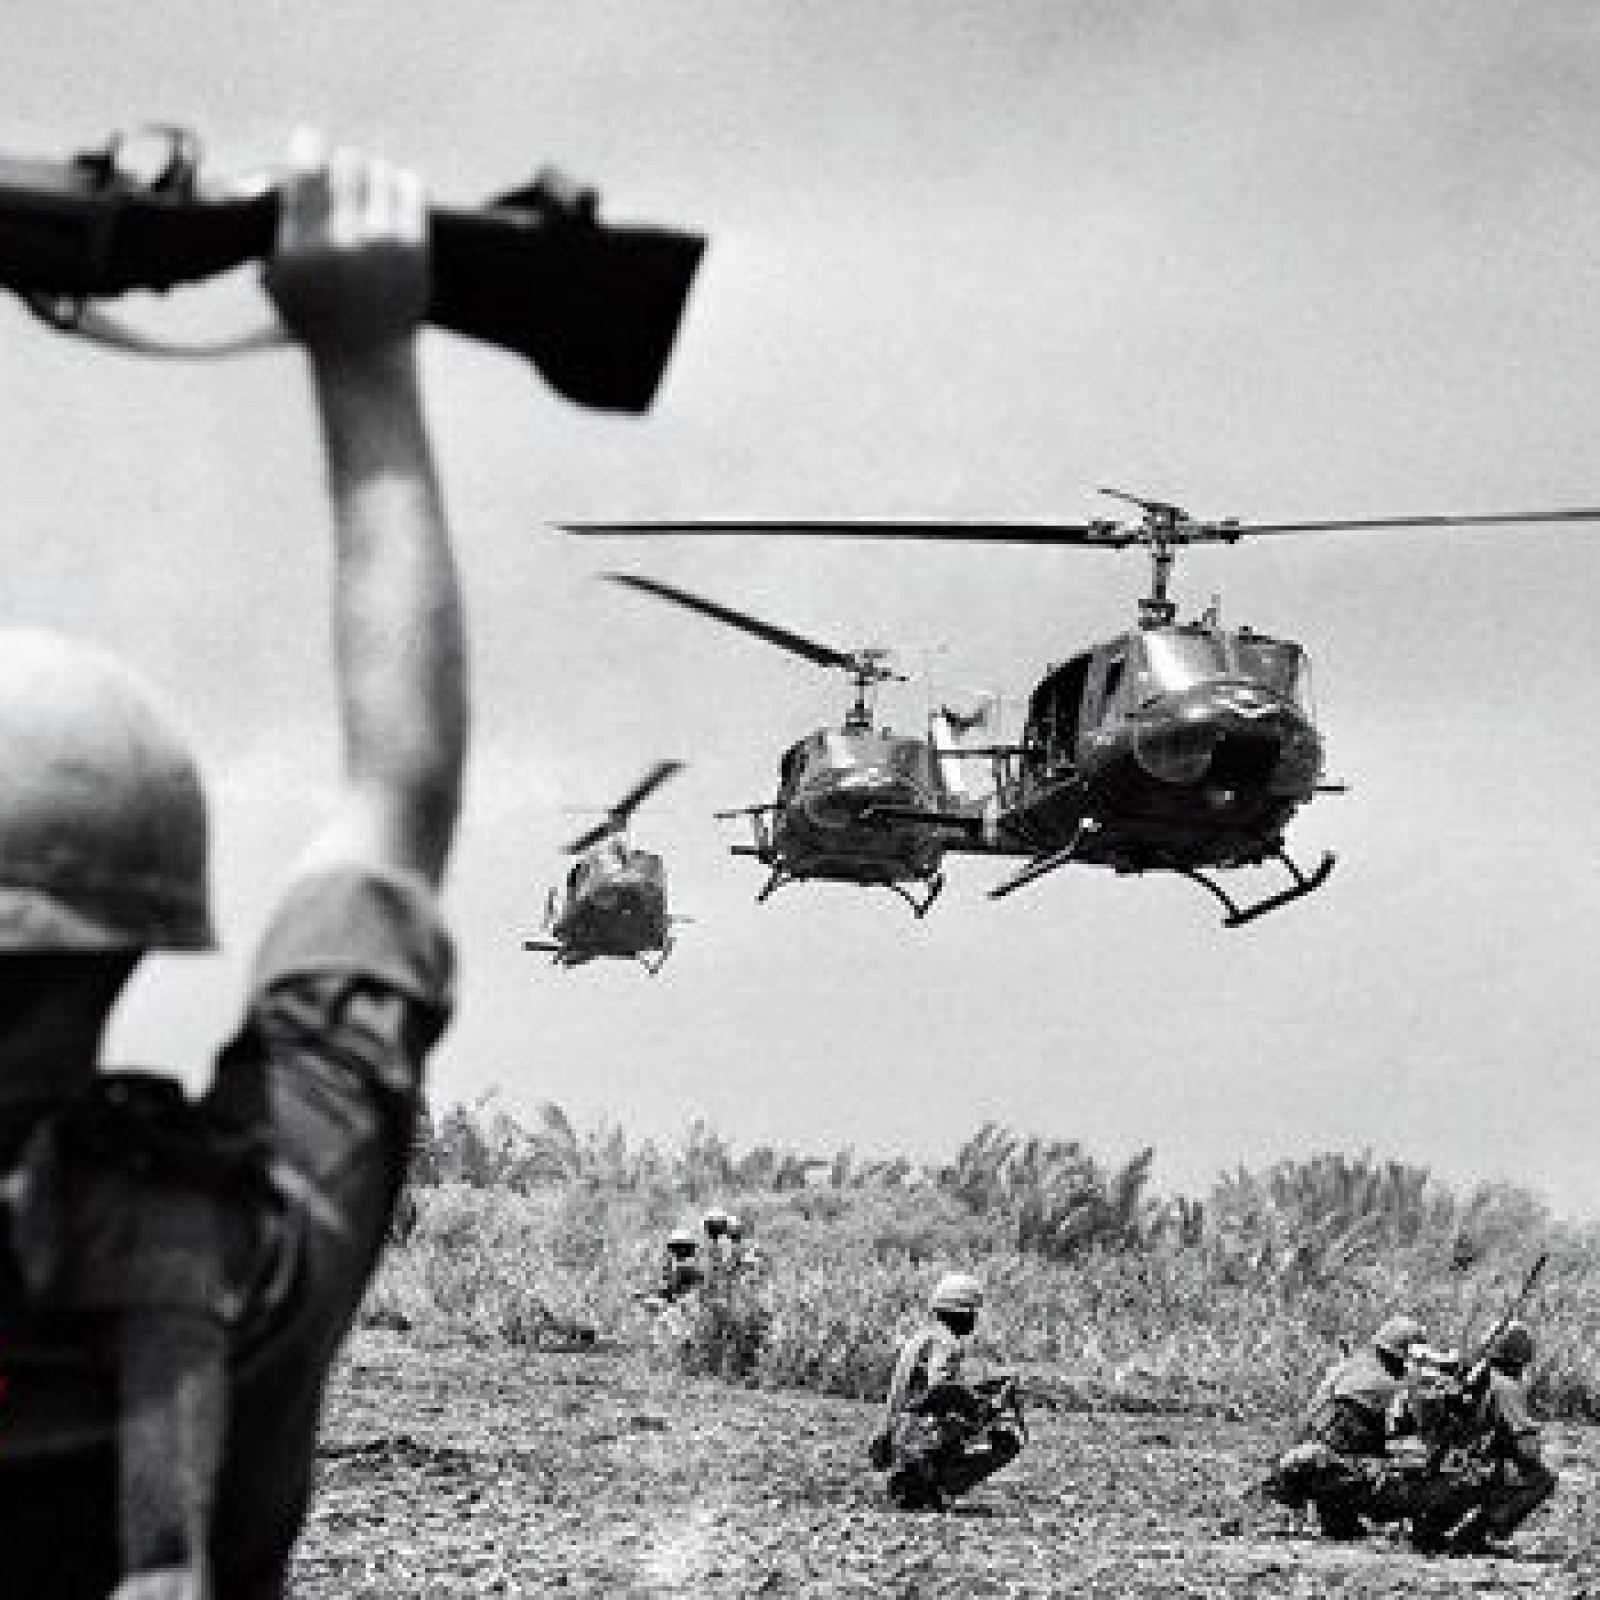 Henri Huet's Vietnam War Photos on Display